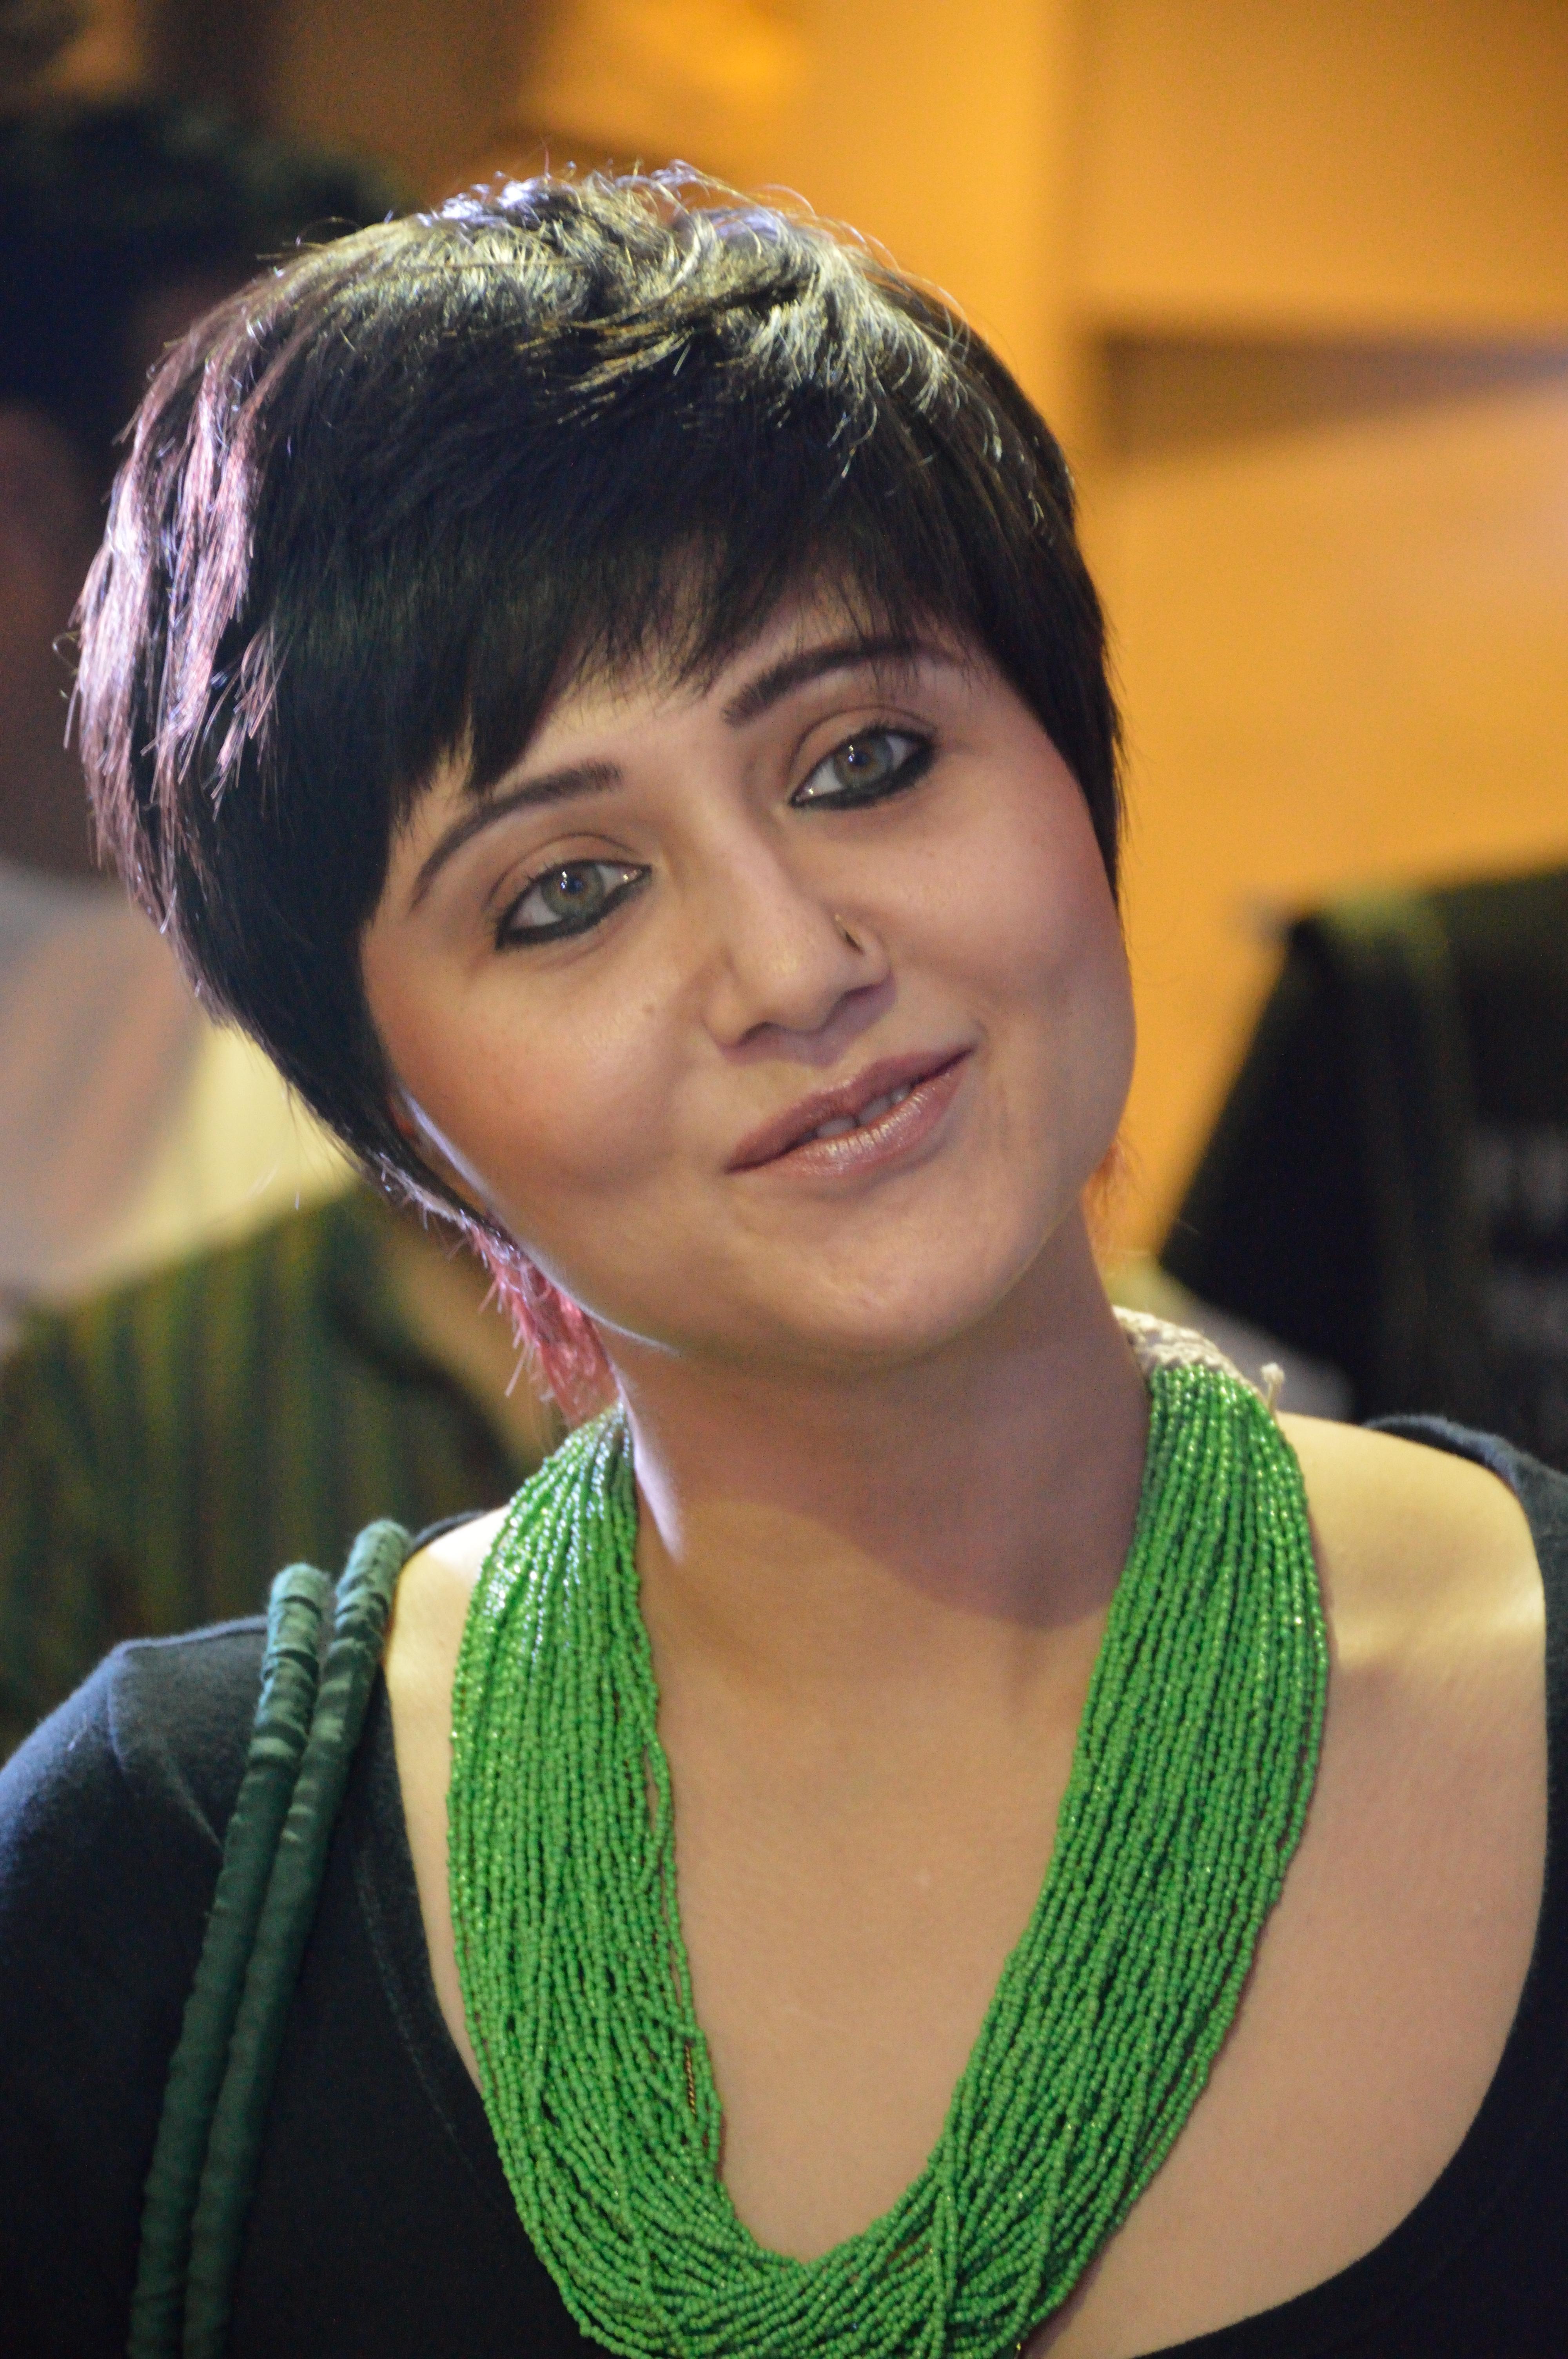 Paparazzi Swastika Mukherjee  nudes (22 photo), Twitter, panties